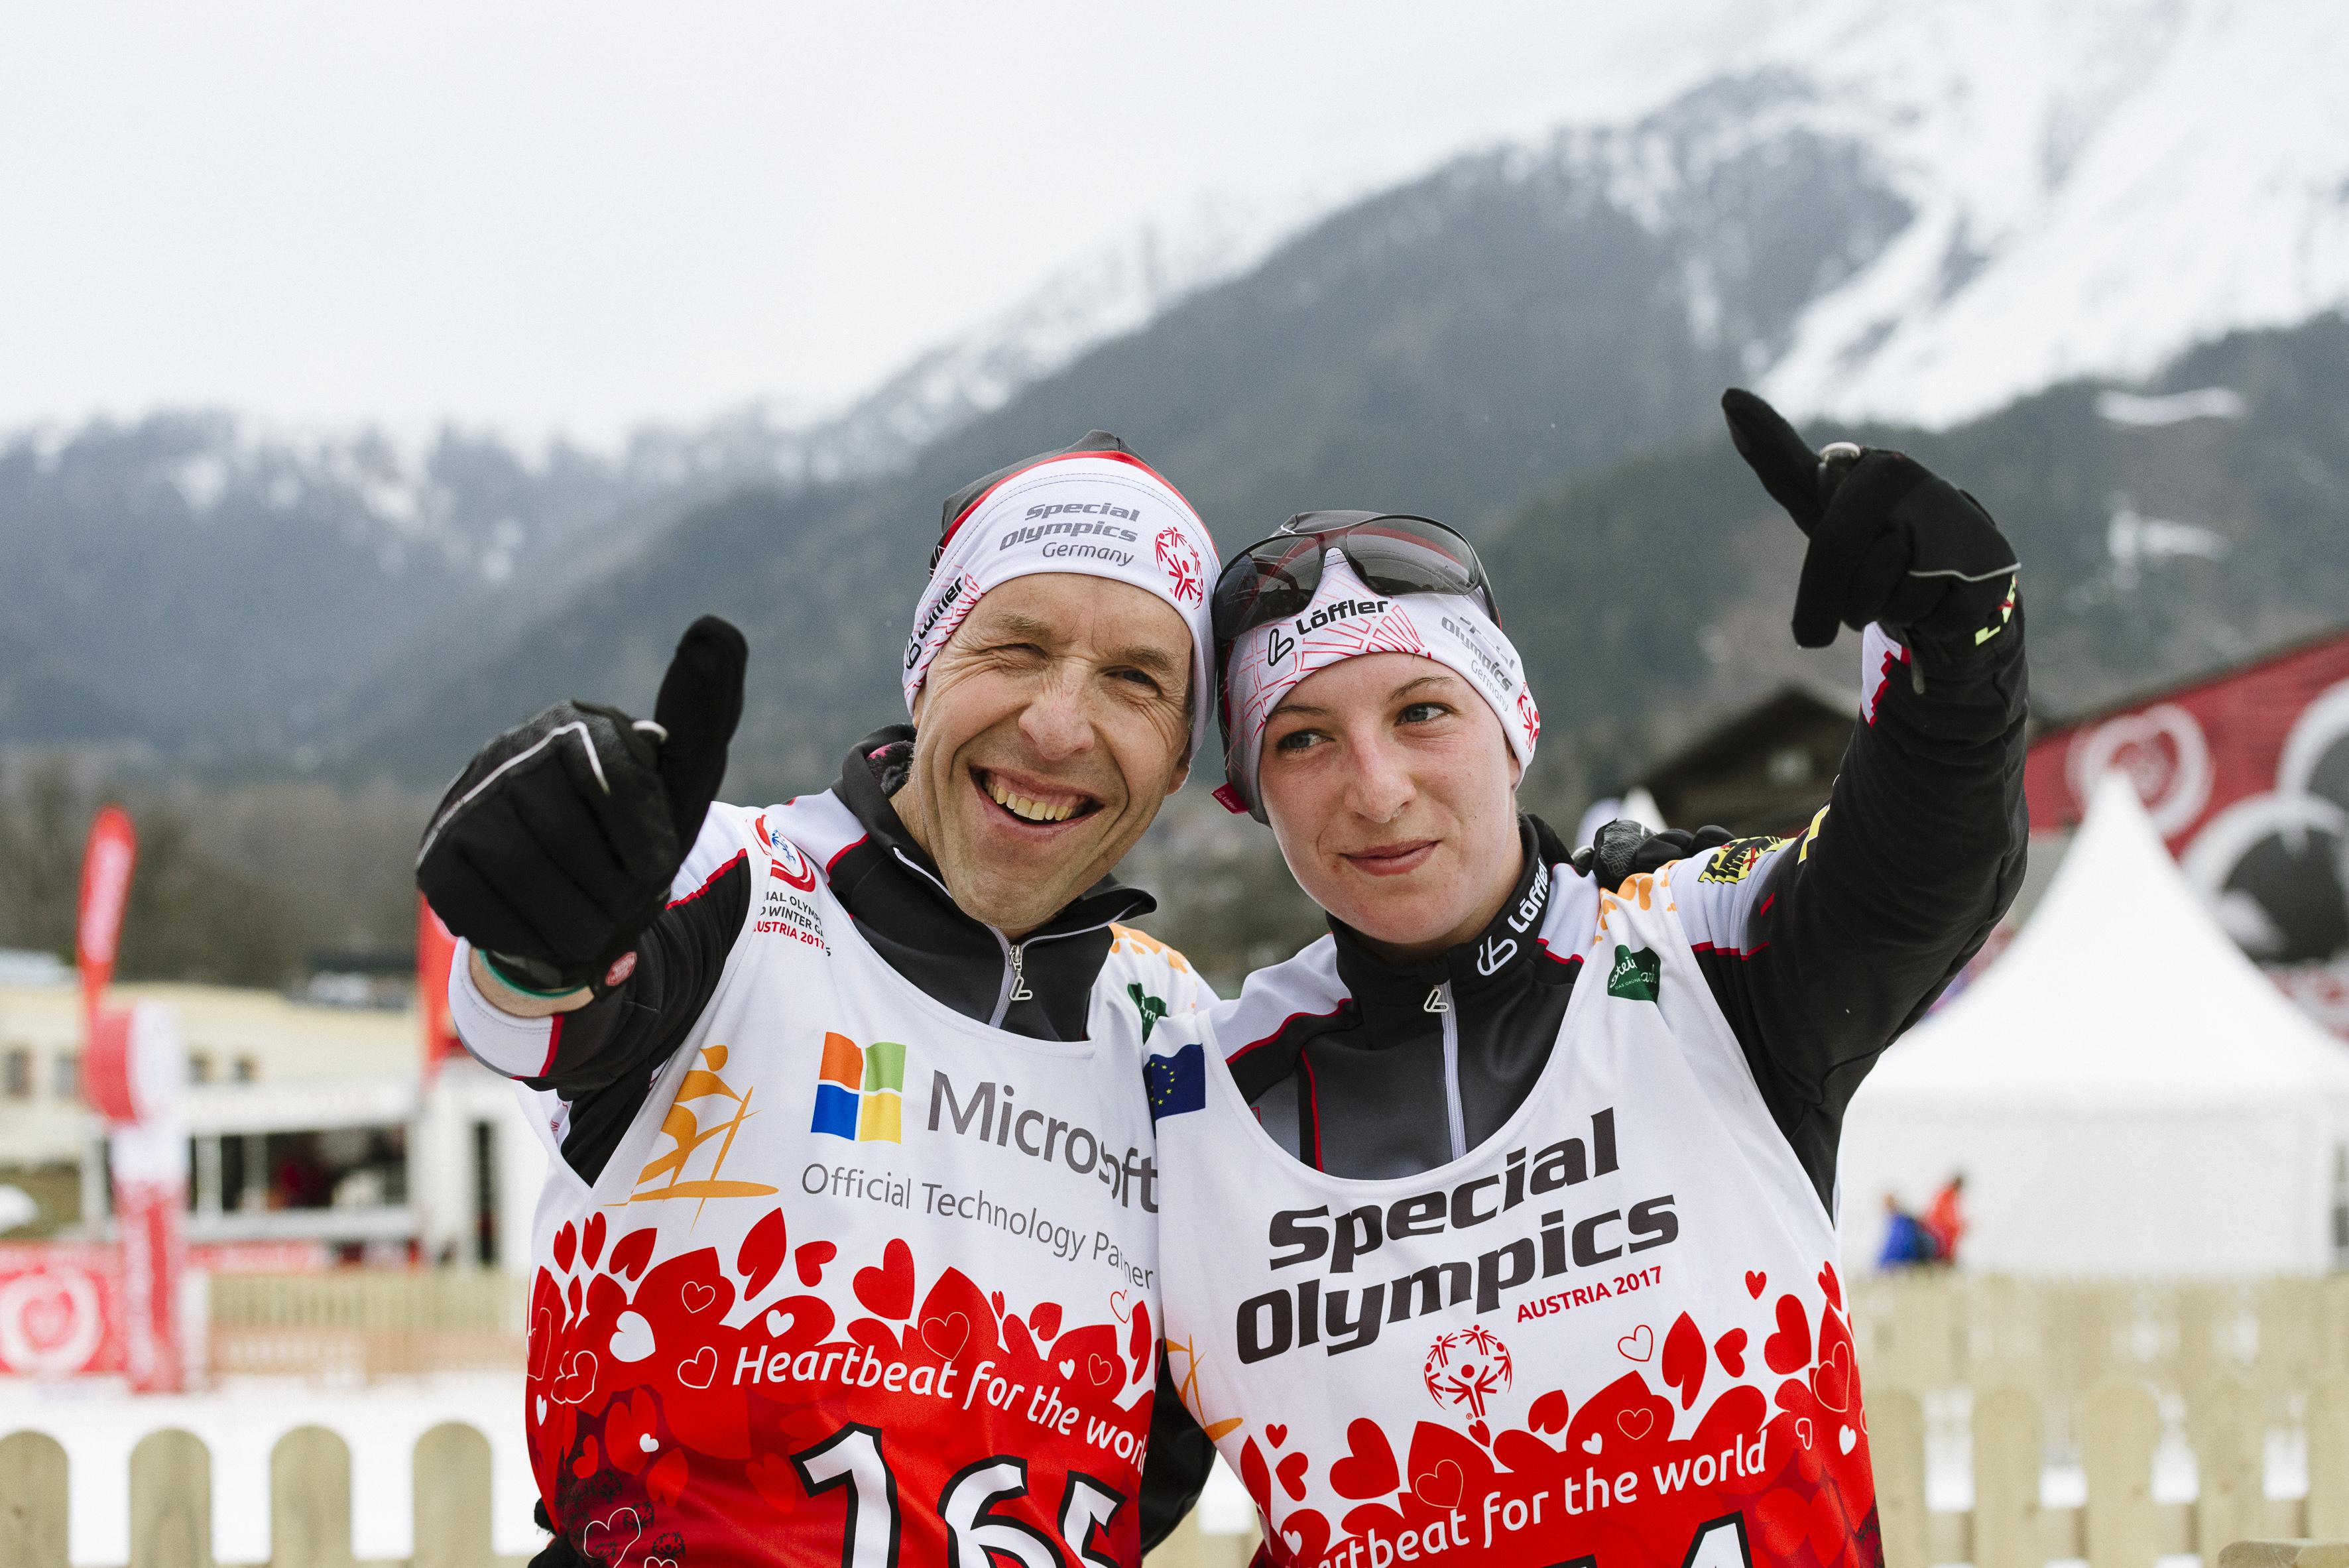 Special Olympics Ski Langlauf